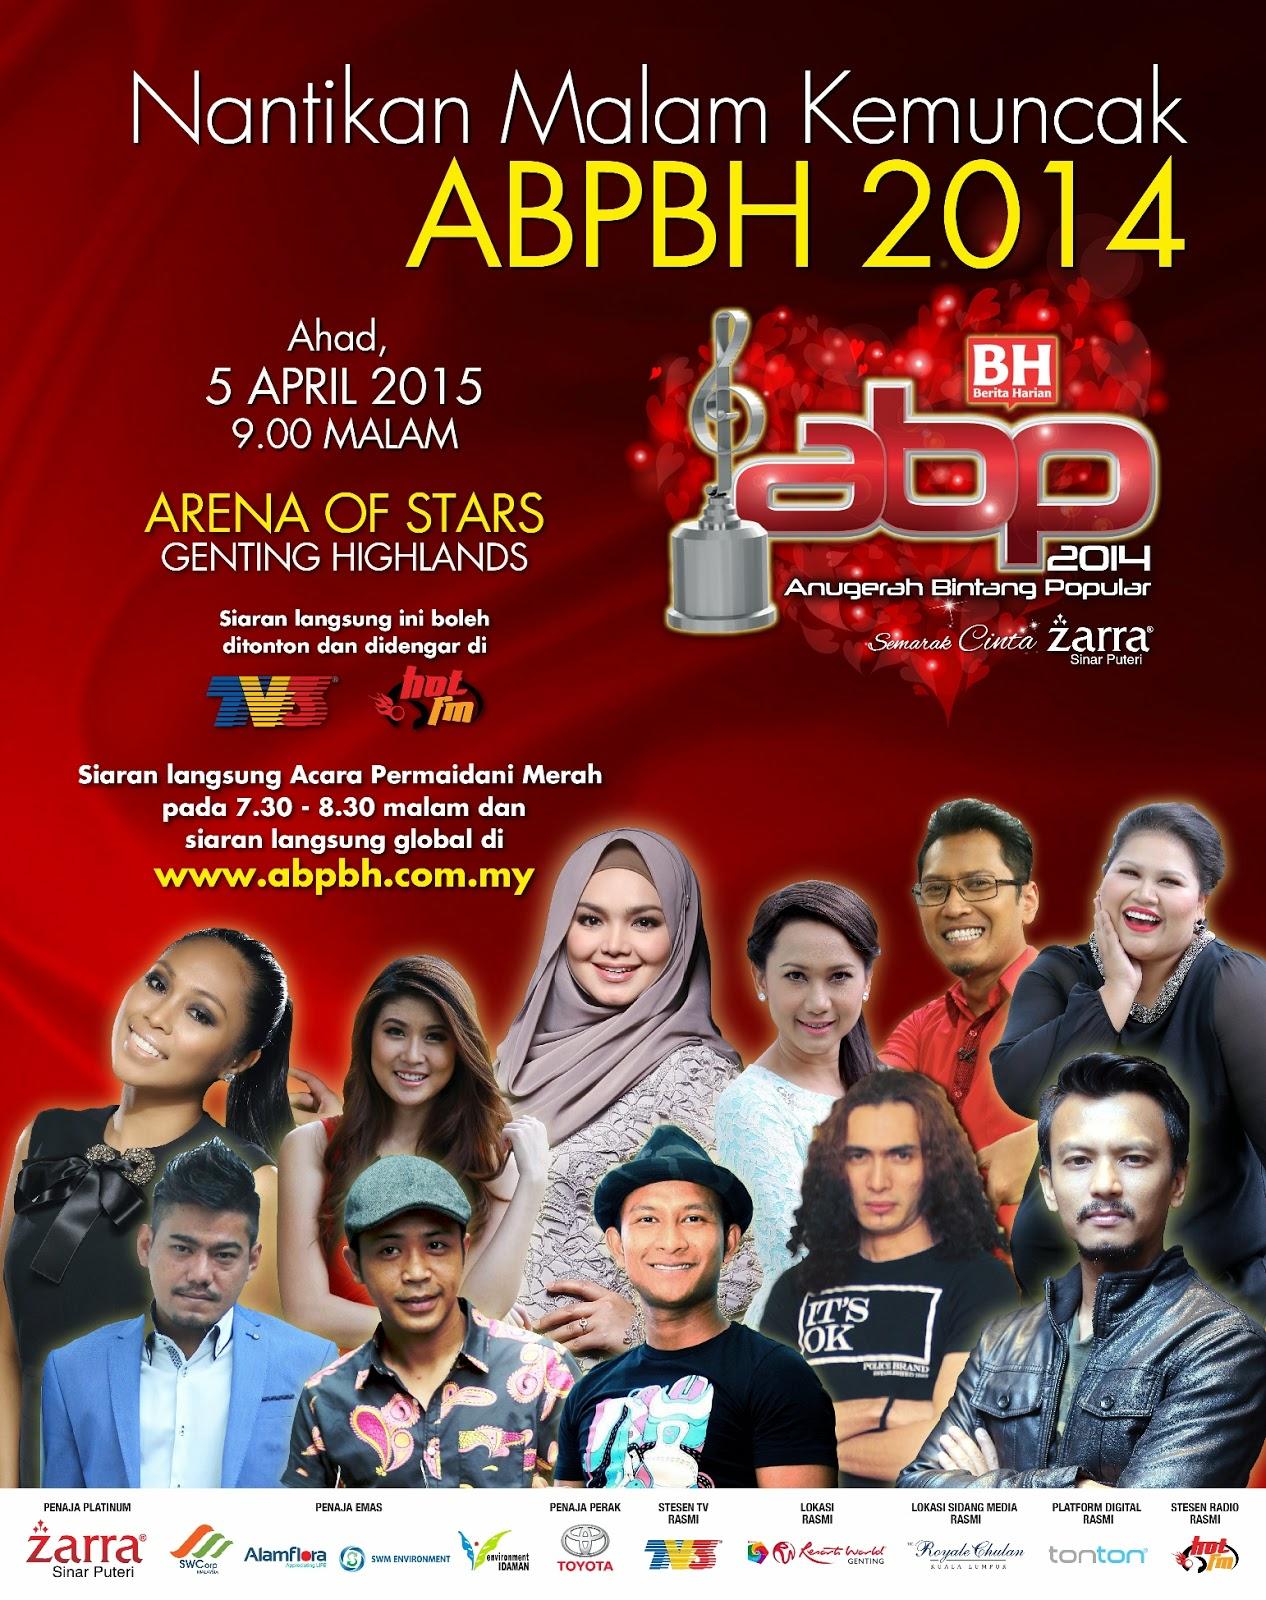 Anugerah Bintang Popular Berita Harian 2014